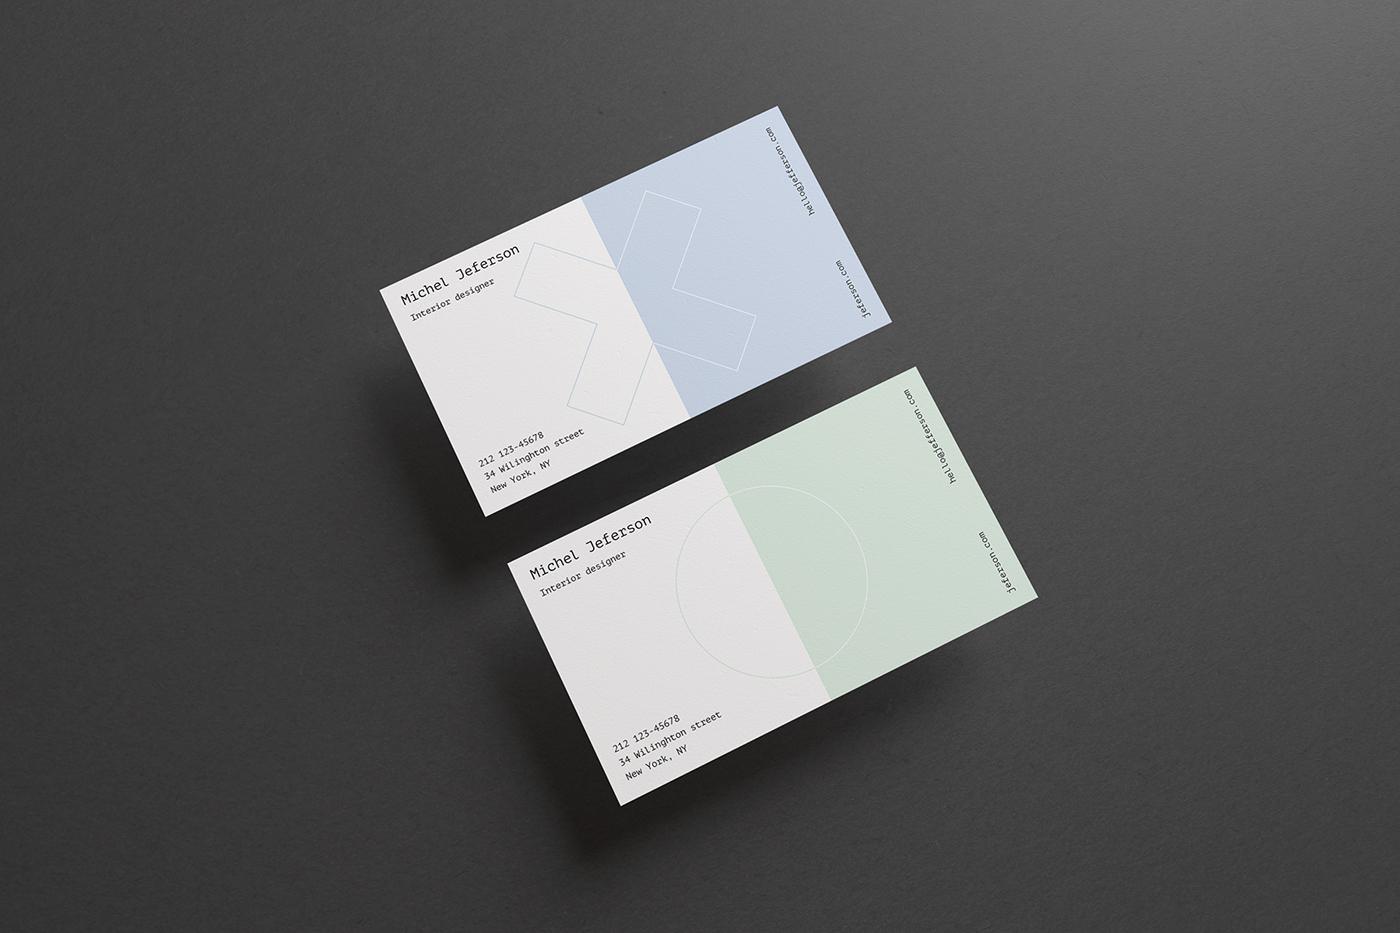 Horizontal Business Cards Mock-up (free) on Behance